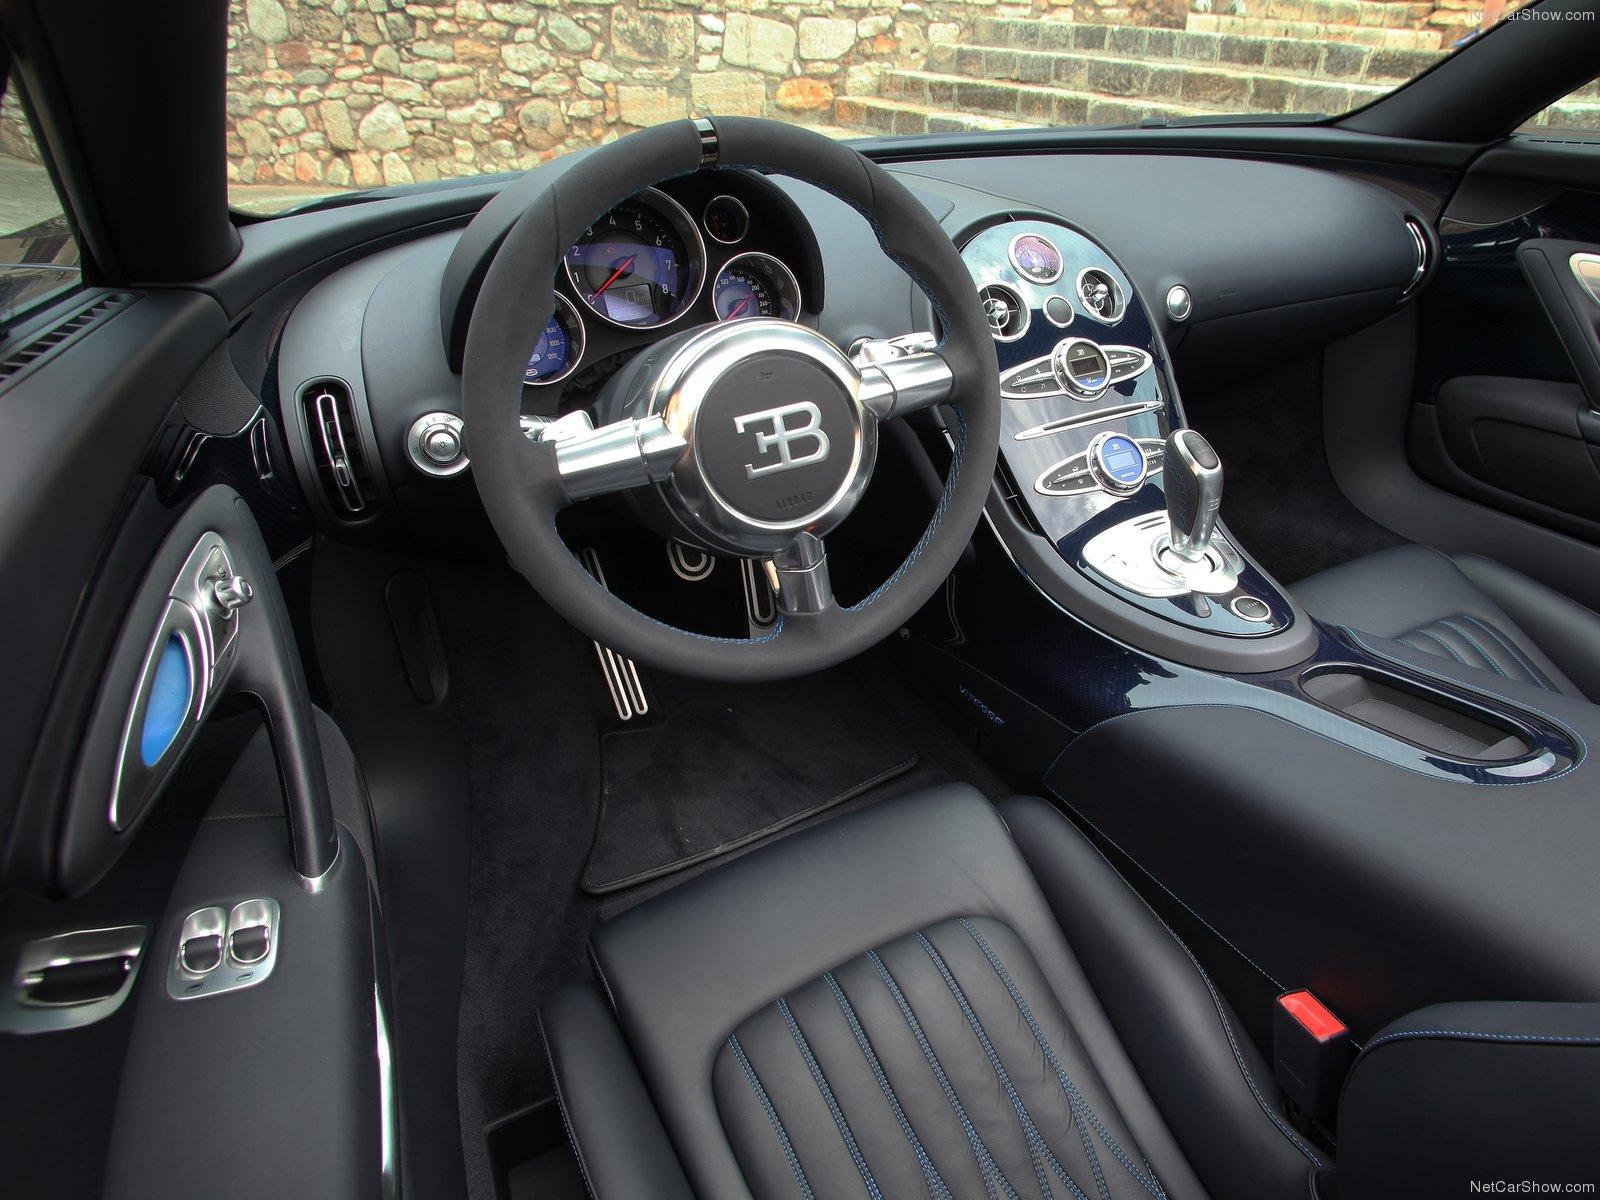 2012%2BBugatti%2BVeyron%2BGrand%2BSport%2BVitesse%2B%252816%2529 Astounding Xe Bugatti Veyron Grand Sport Vitesse Cars Trend